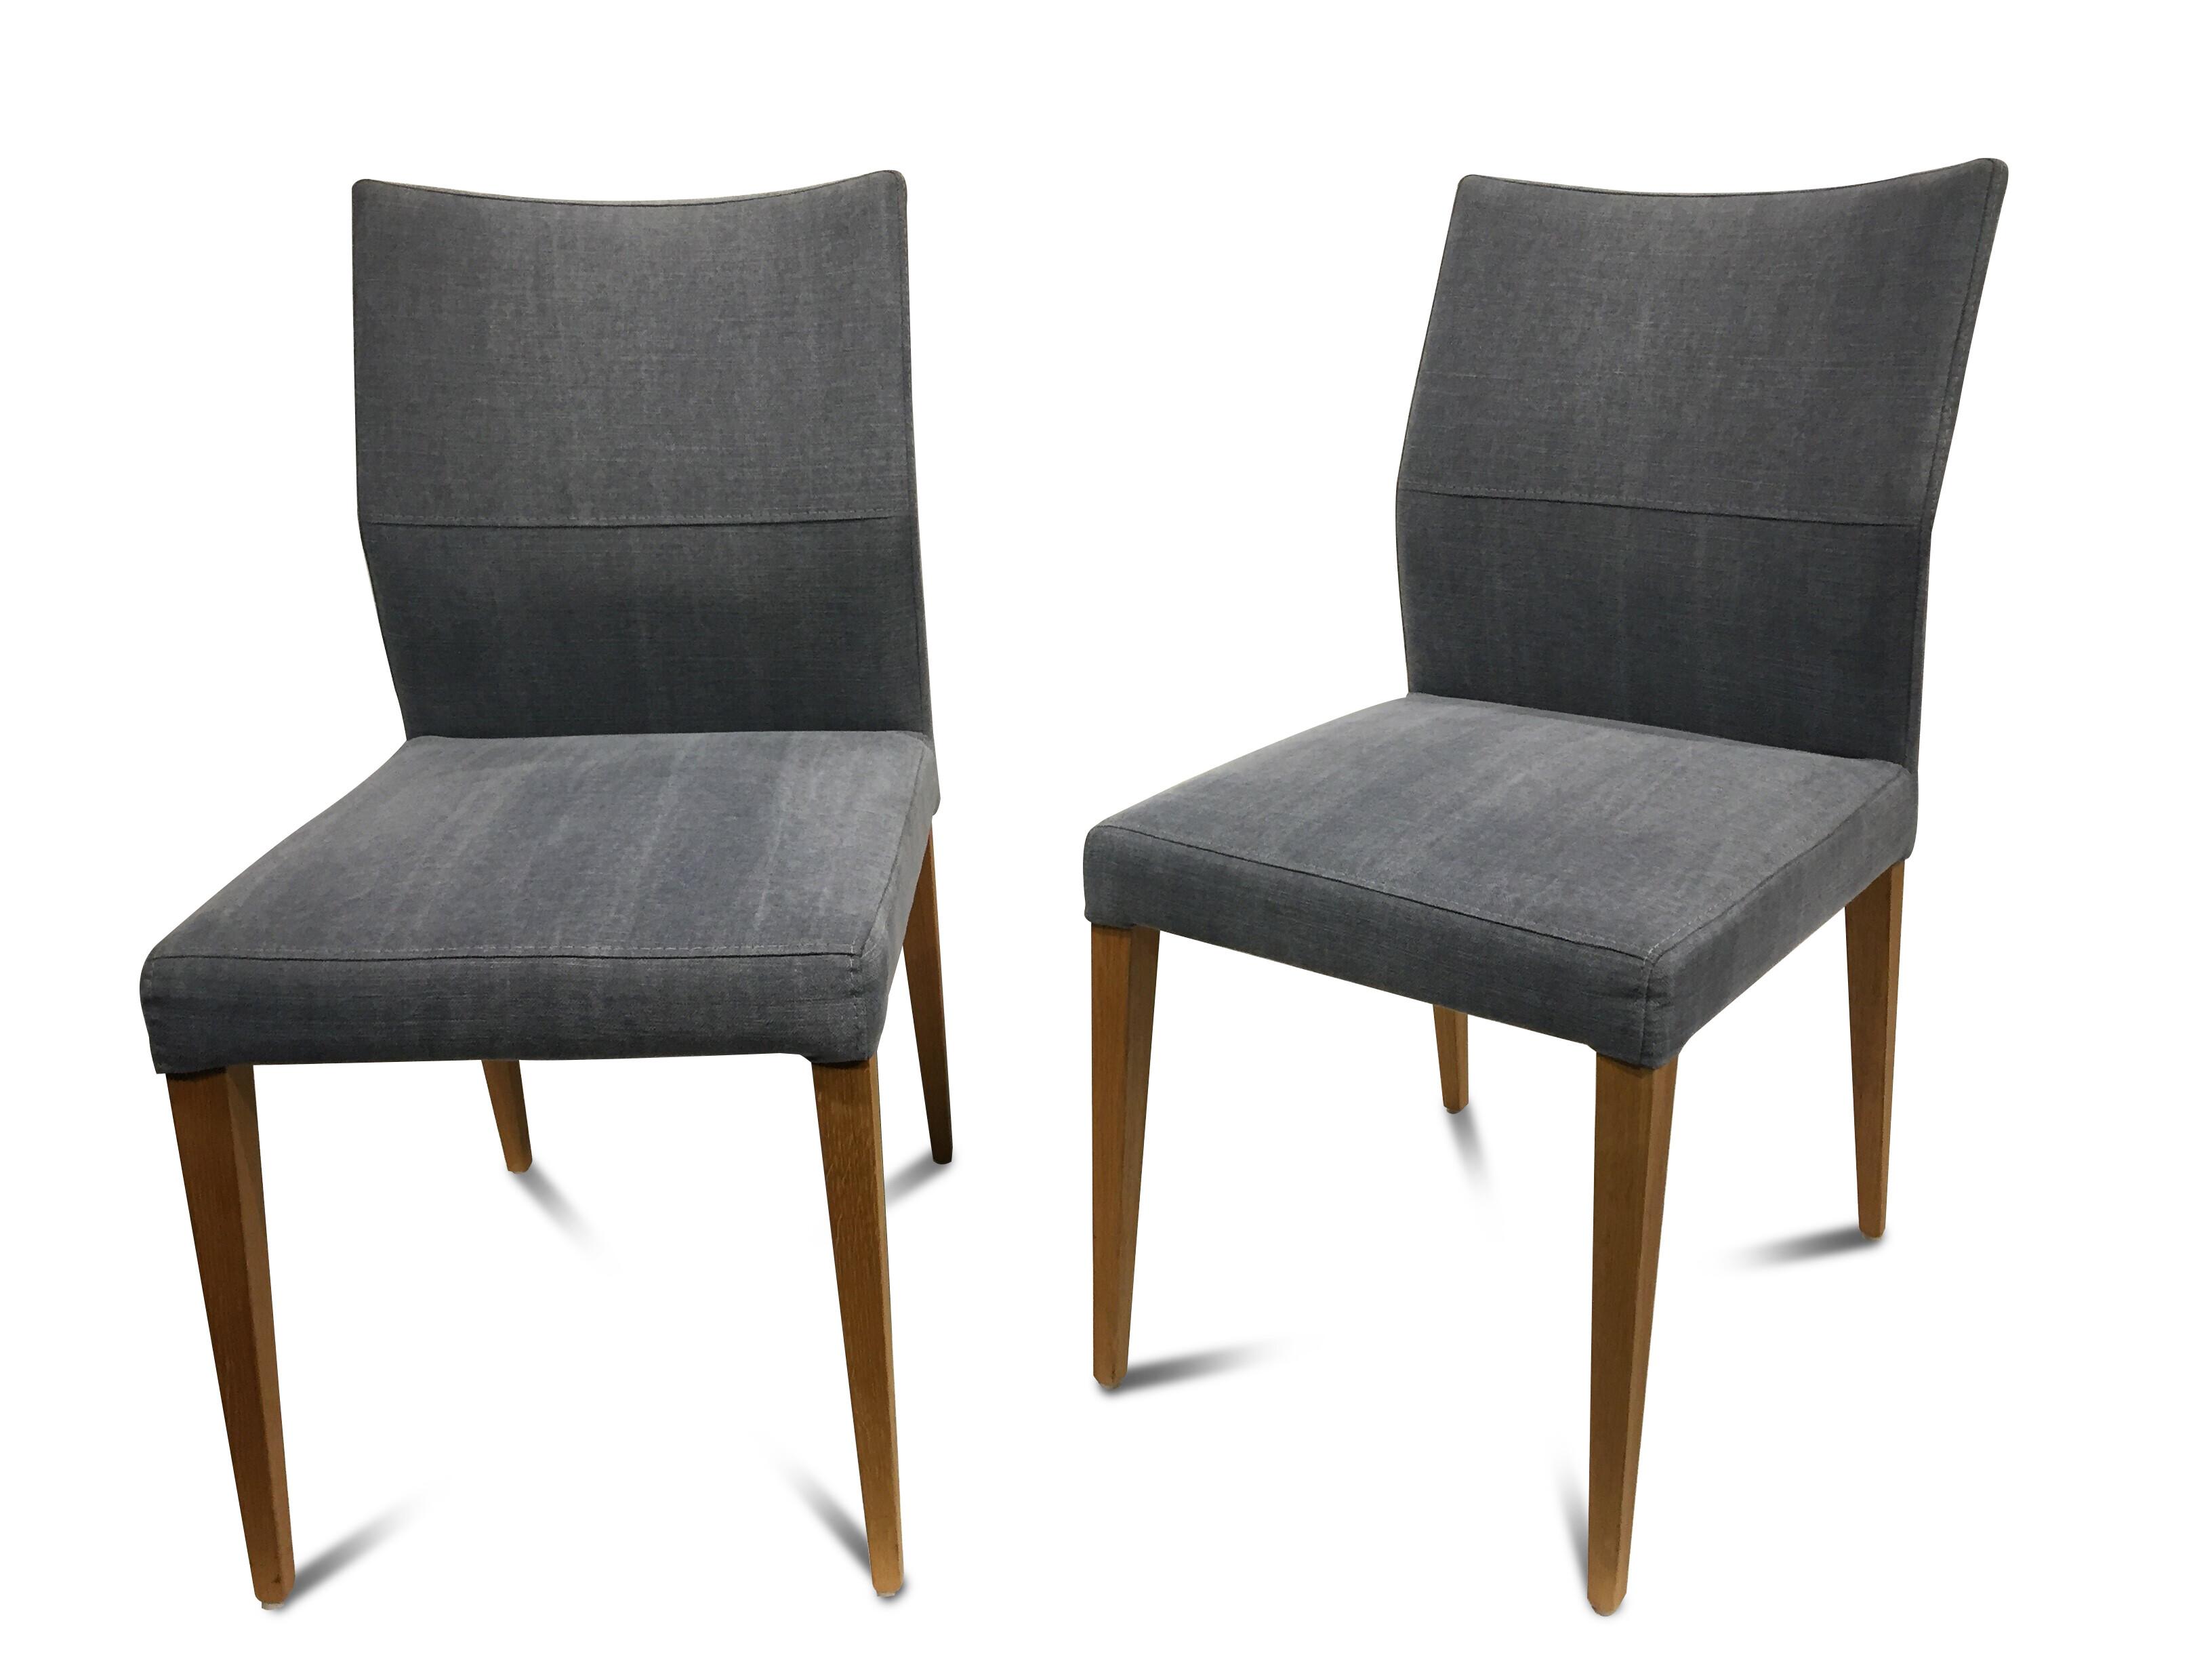 Stuhlkombination mit Sitzbank DORIAN Lüönd 10